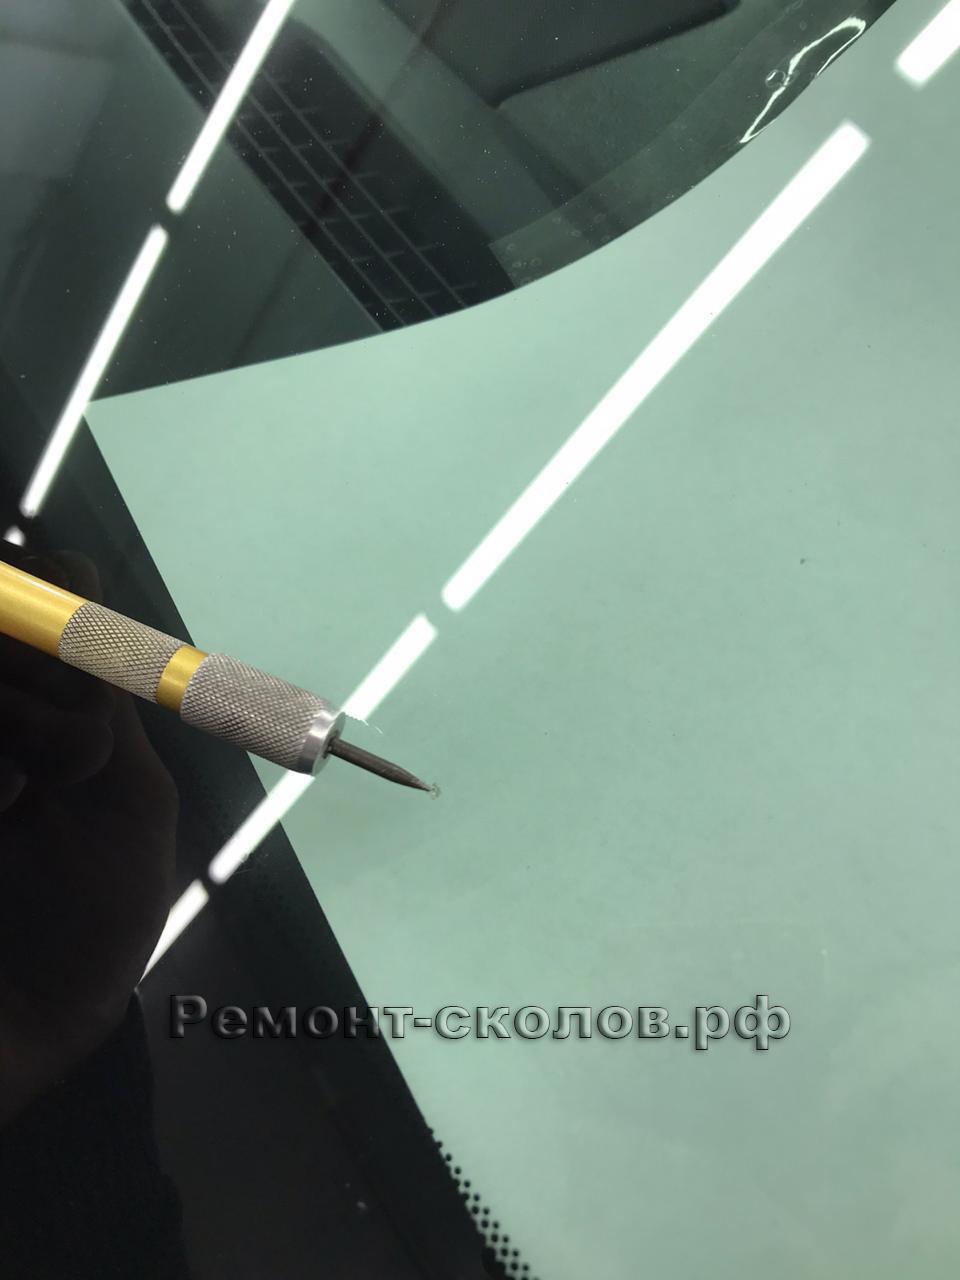 Удаление скола на лобовом стекле Chevrolet Tahoe